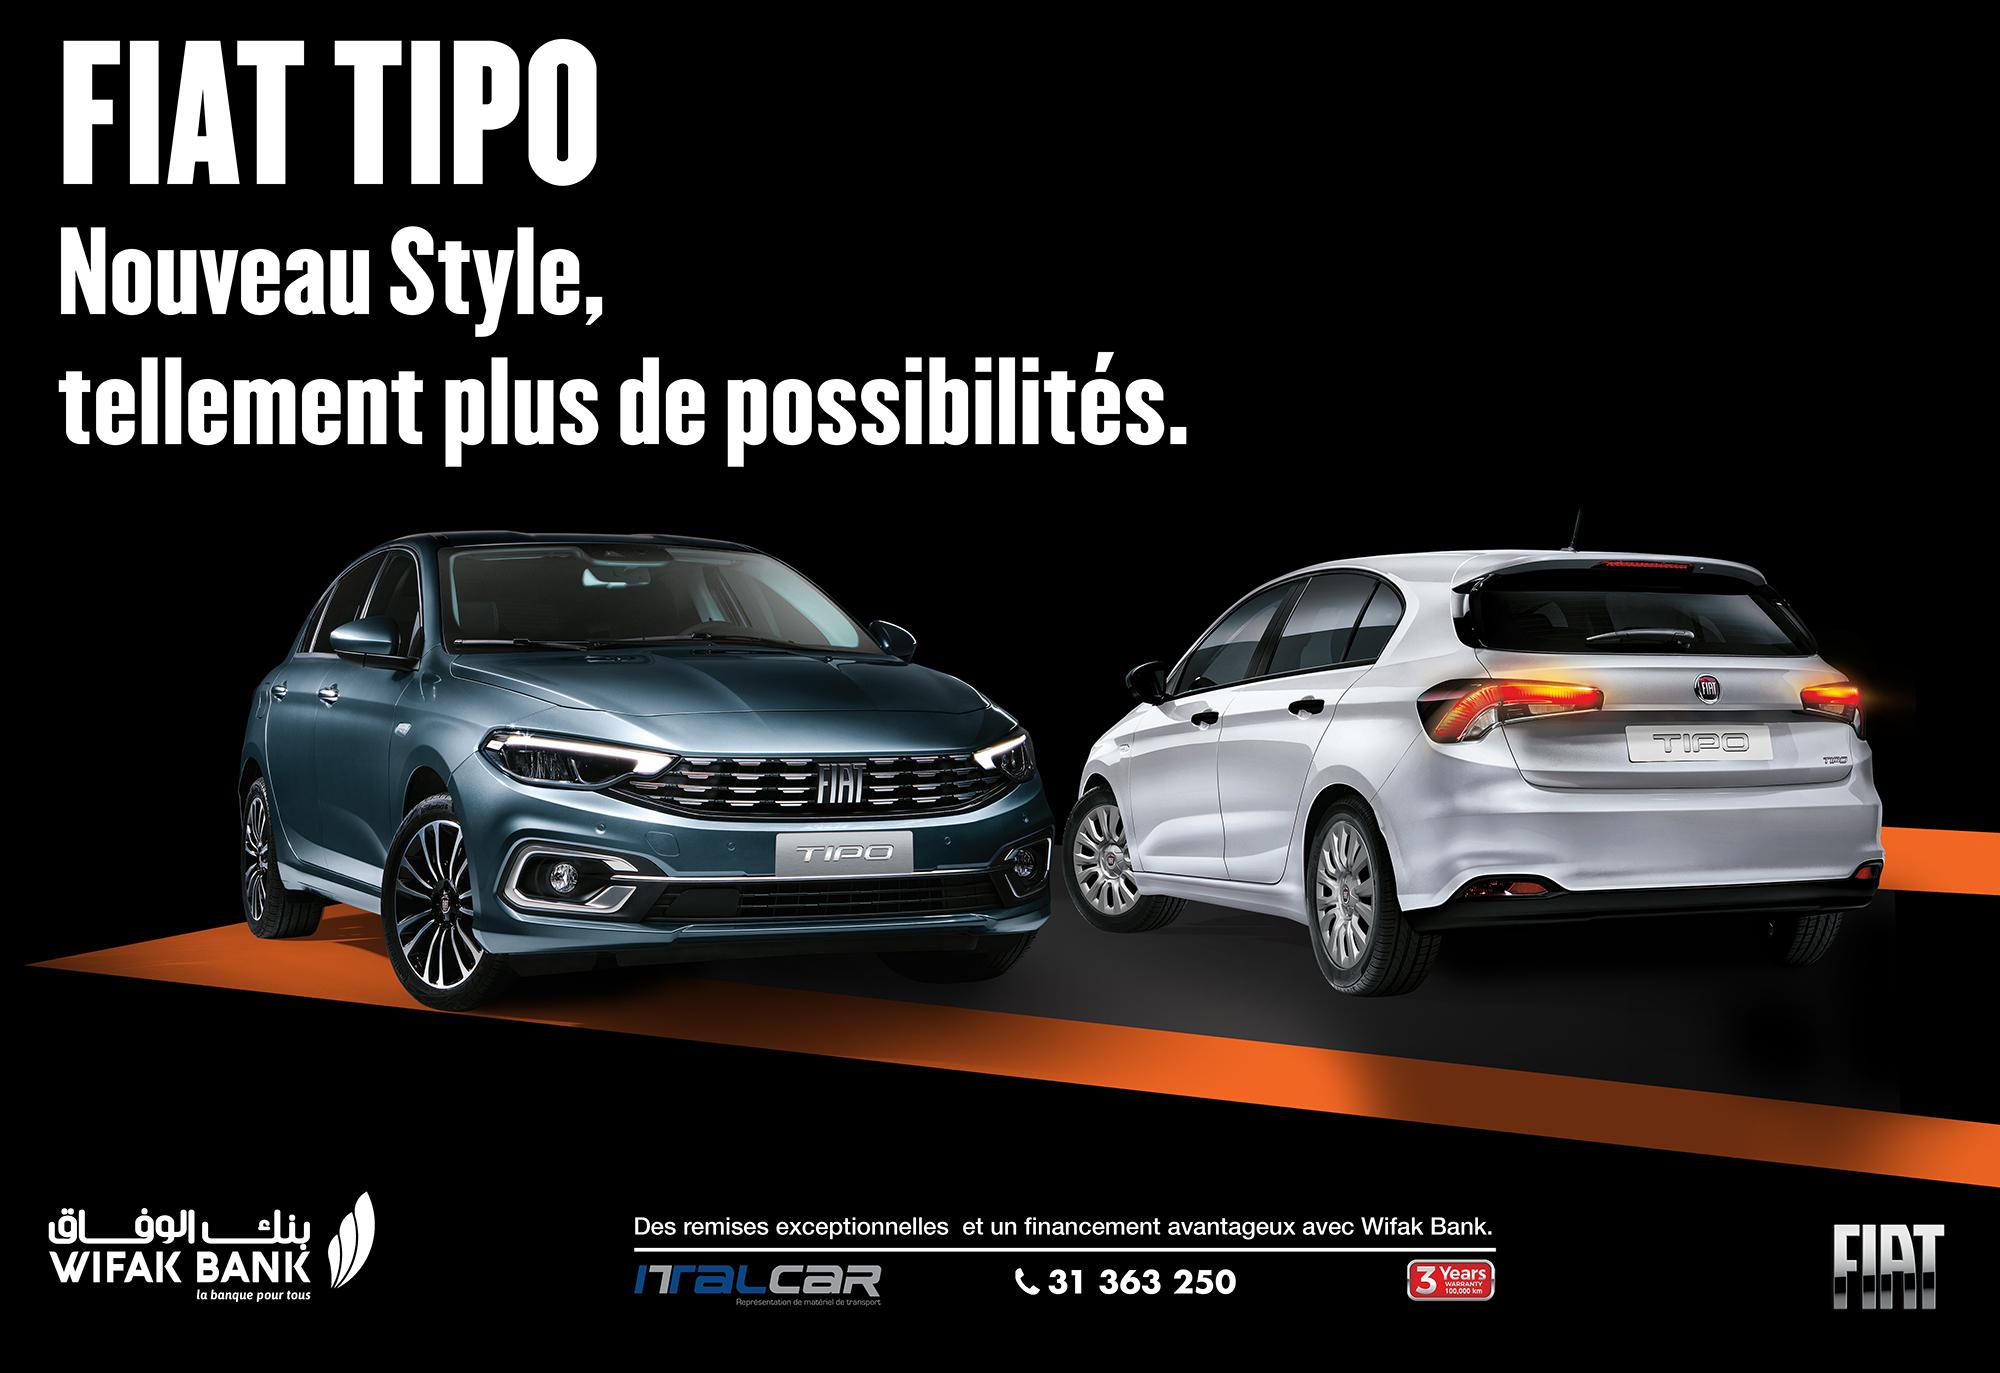 Nouveau Fiat Tipo chez Italcar